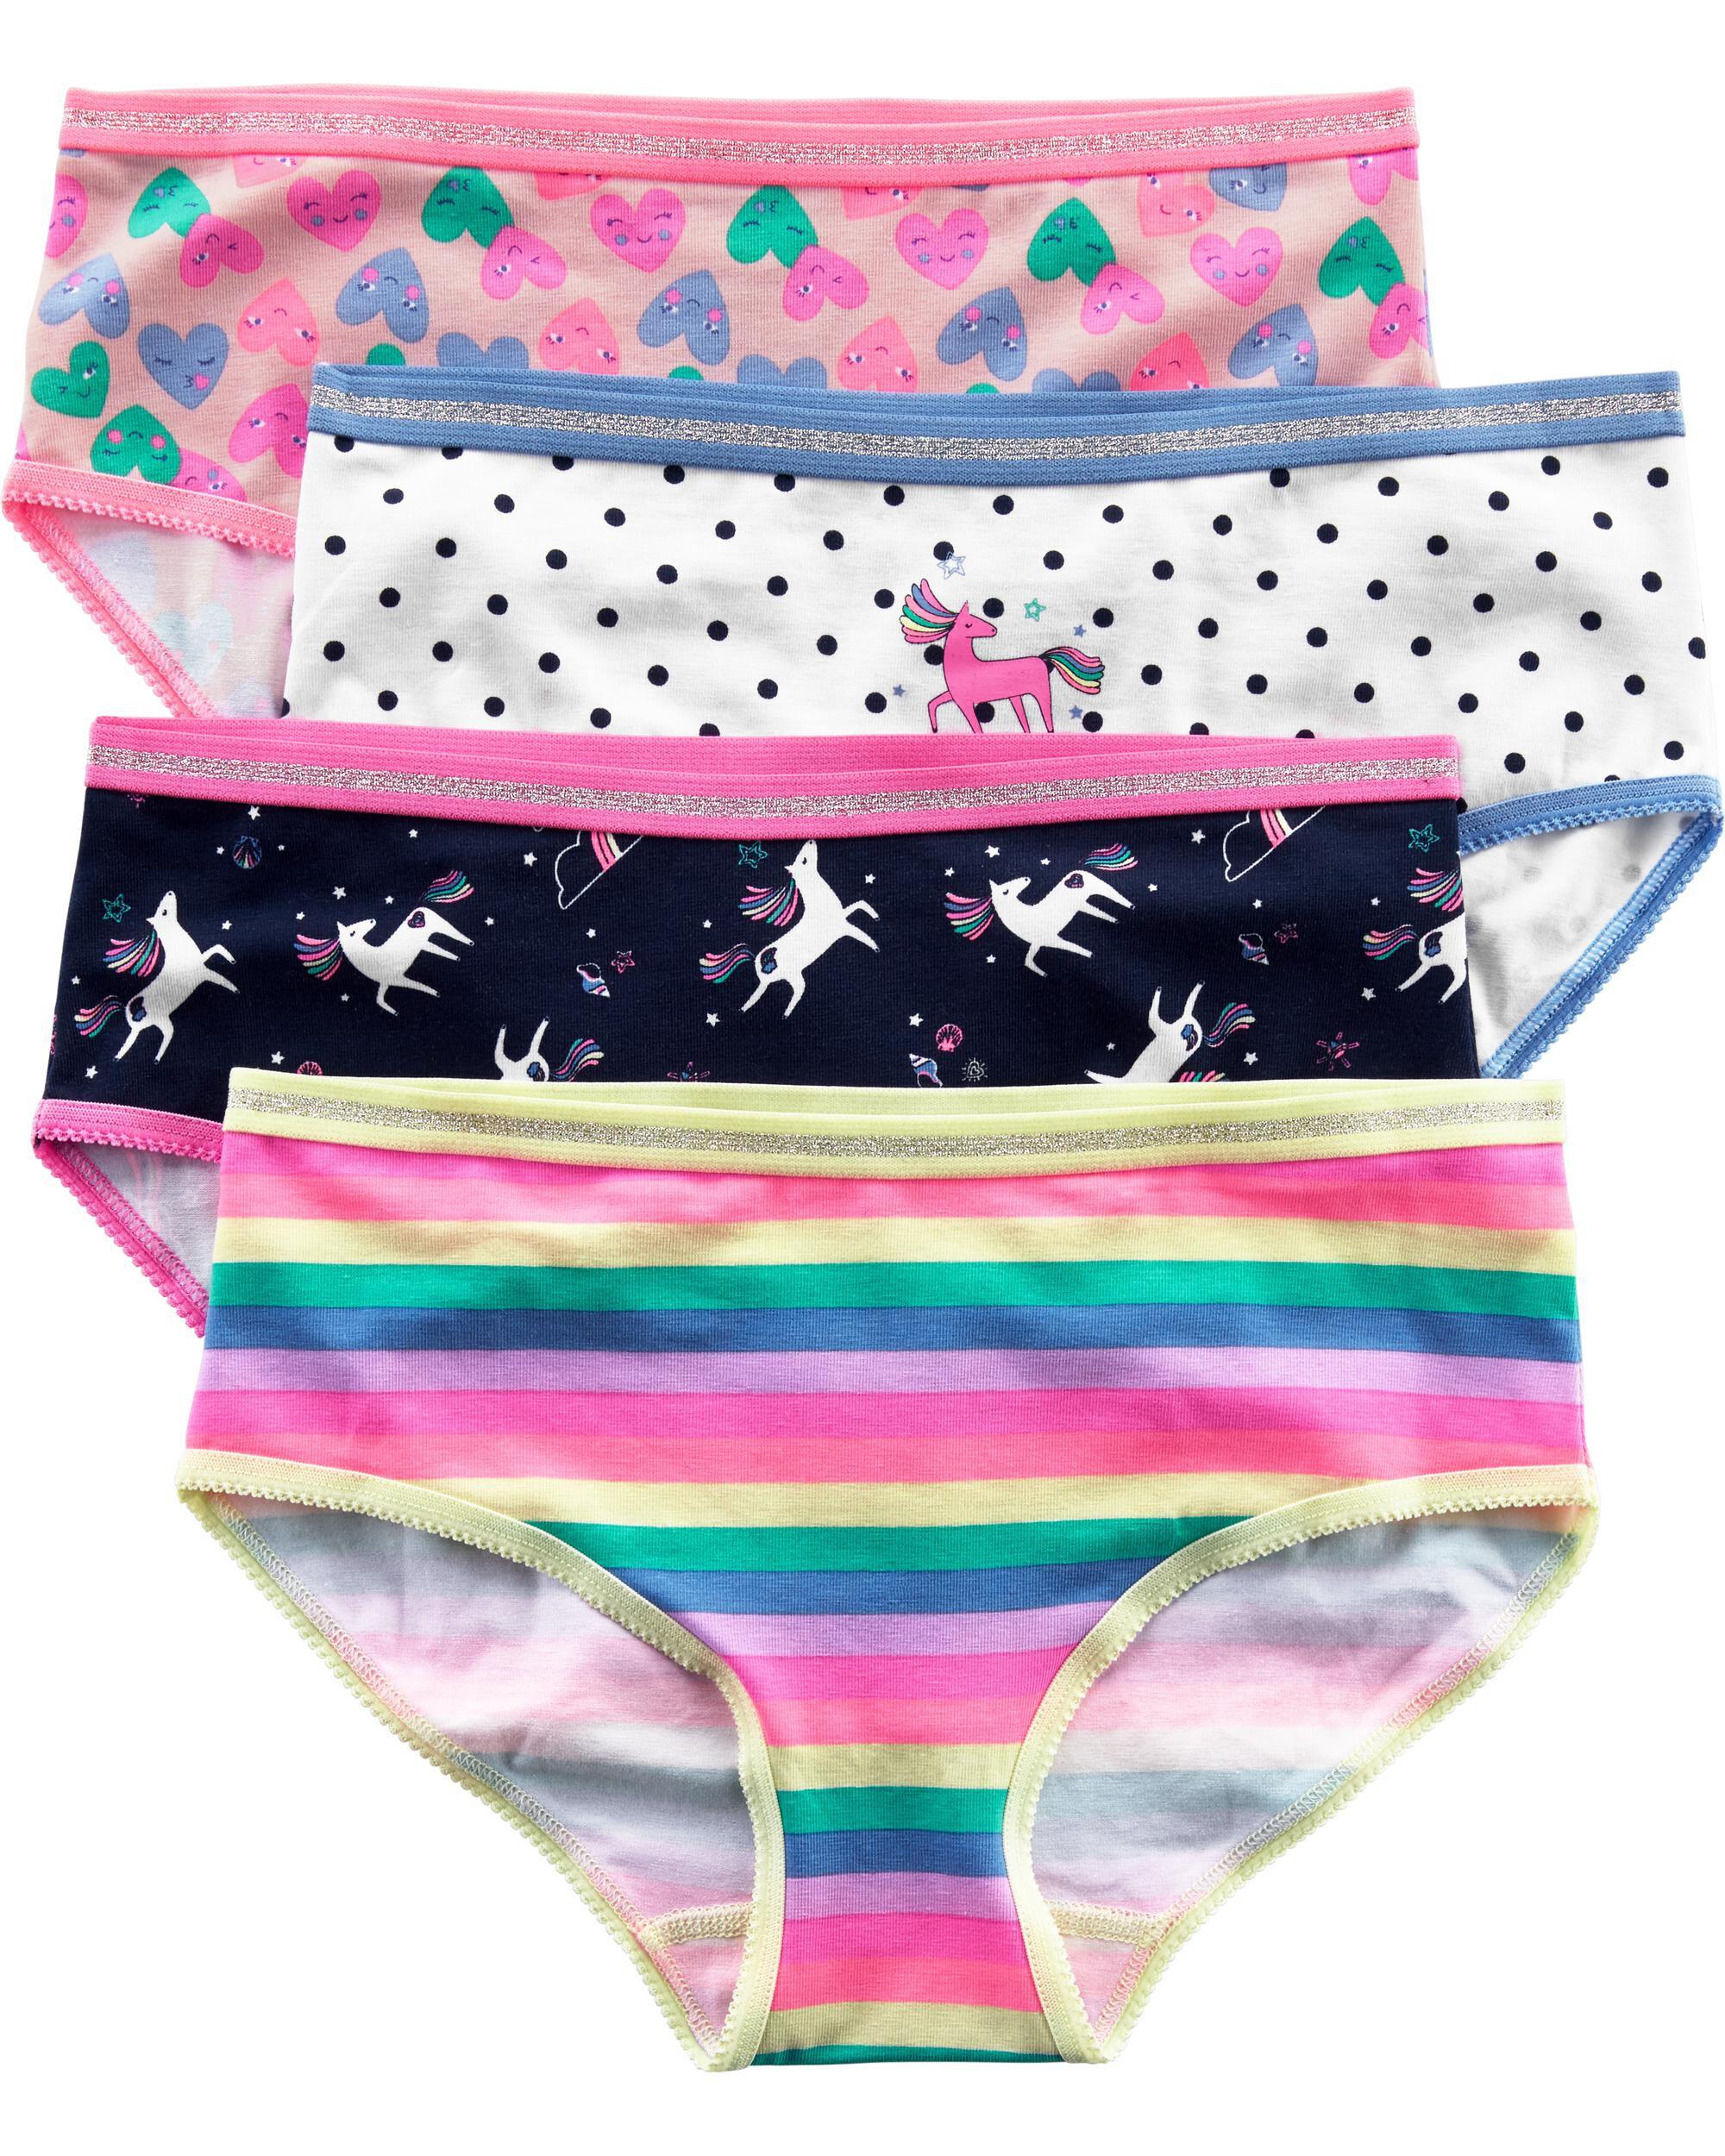 Just Essentials Girls Back to School 5 Pack Cotton Heart Print Briefs